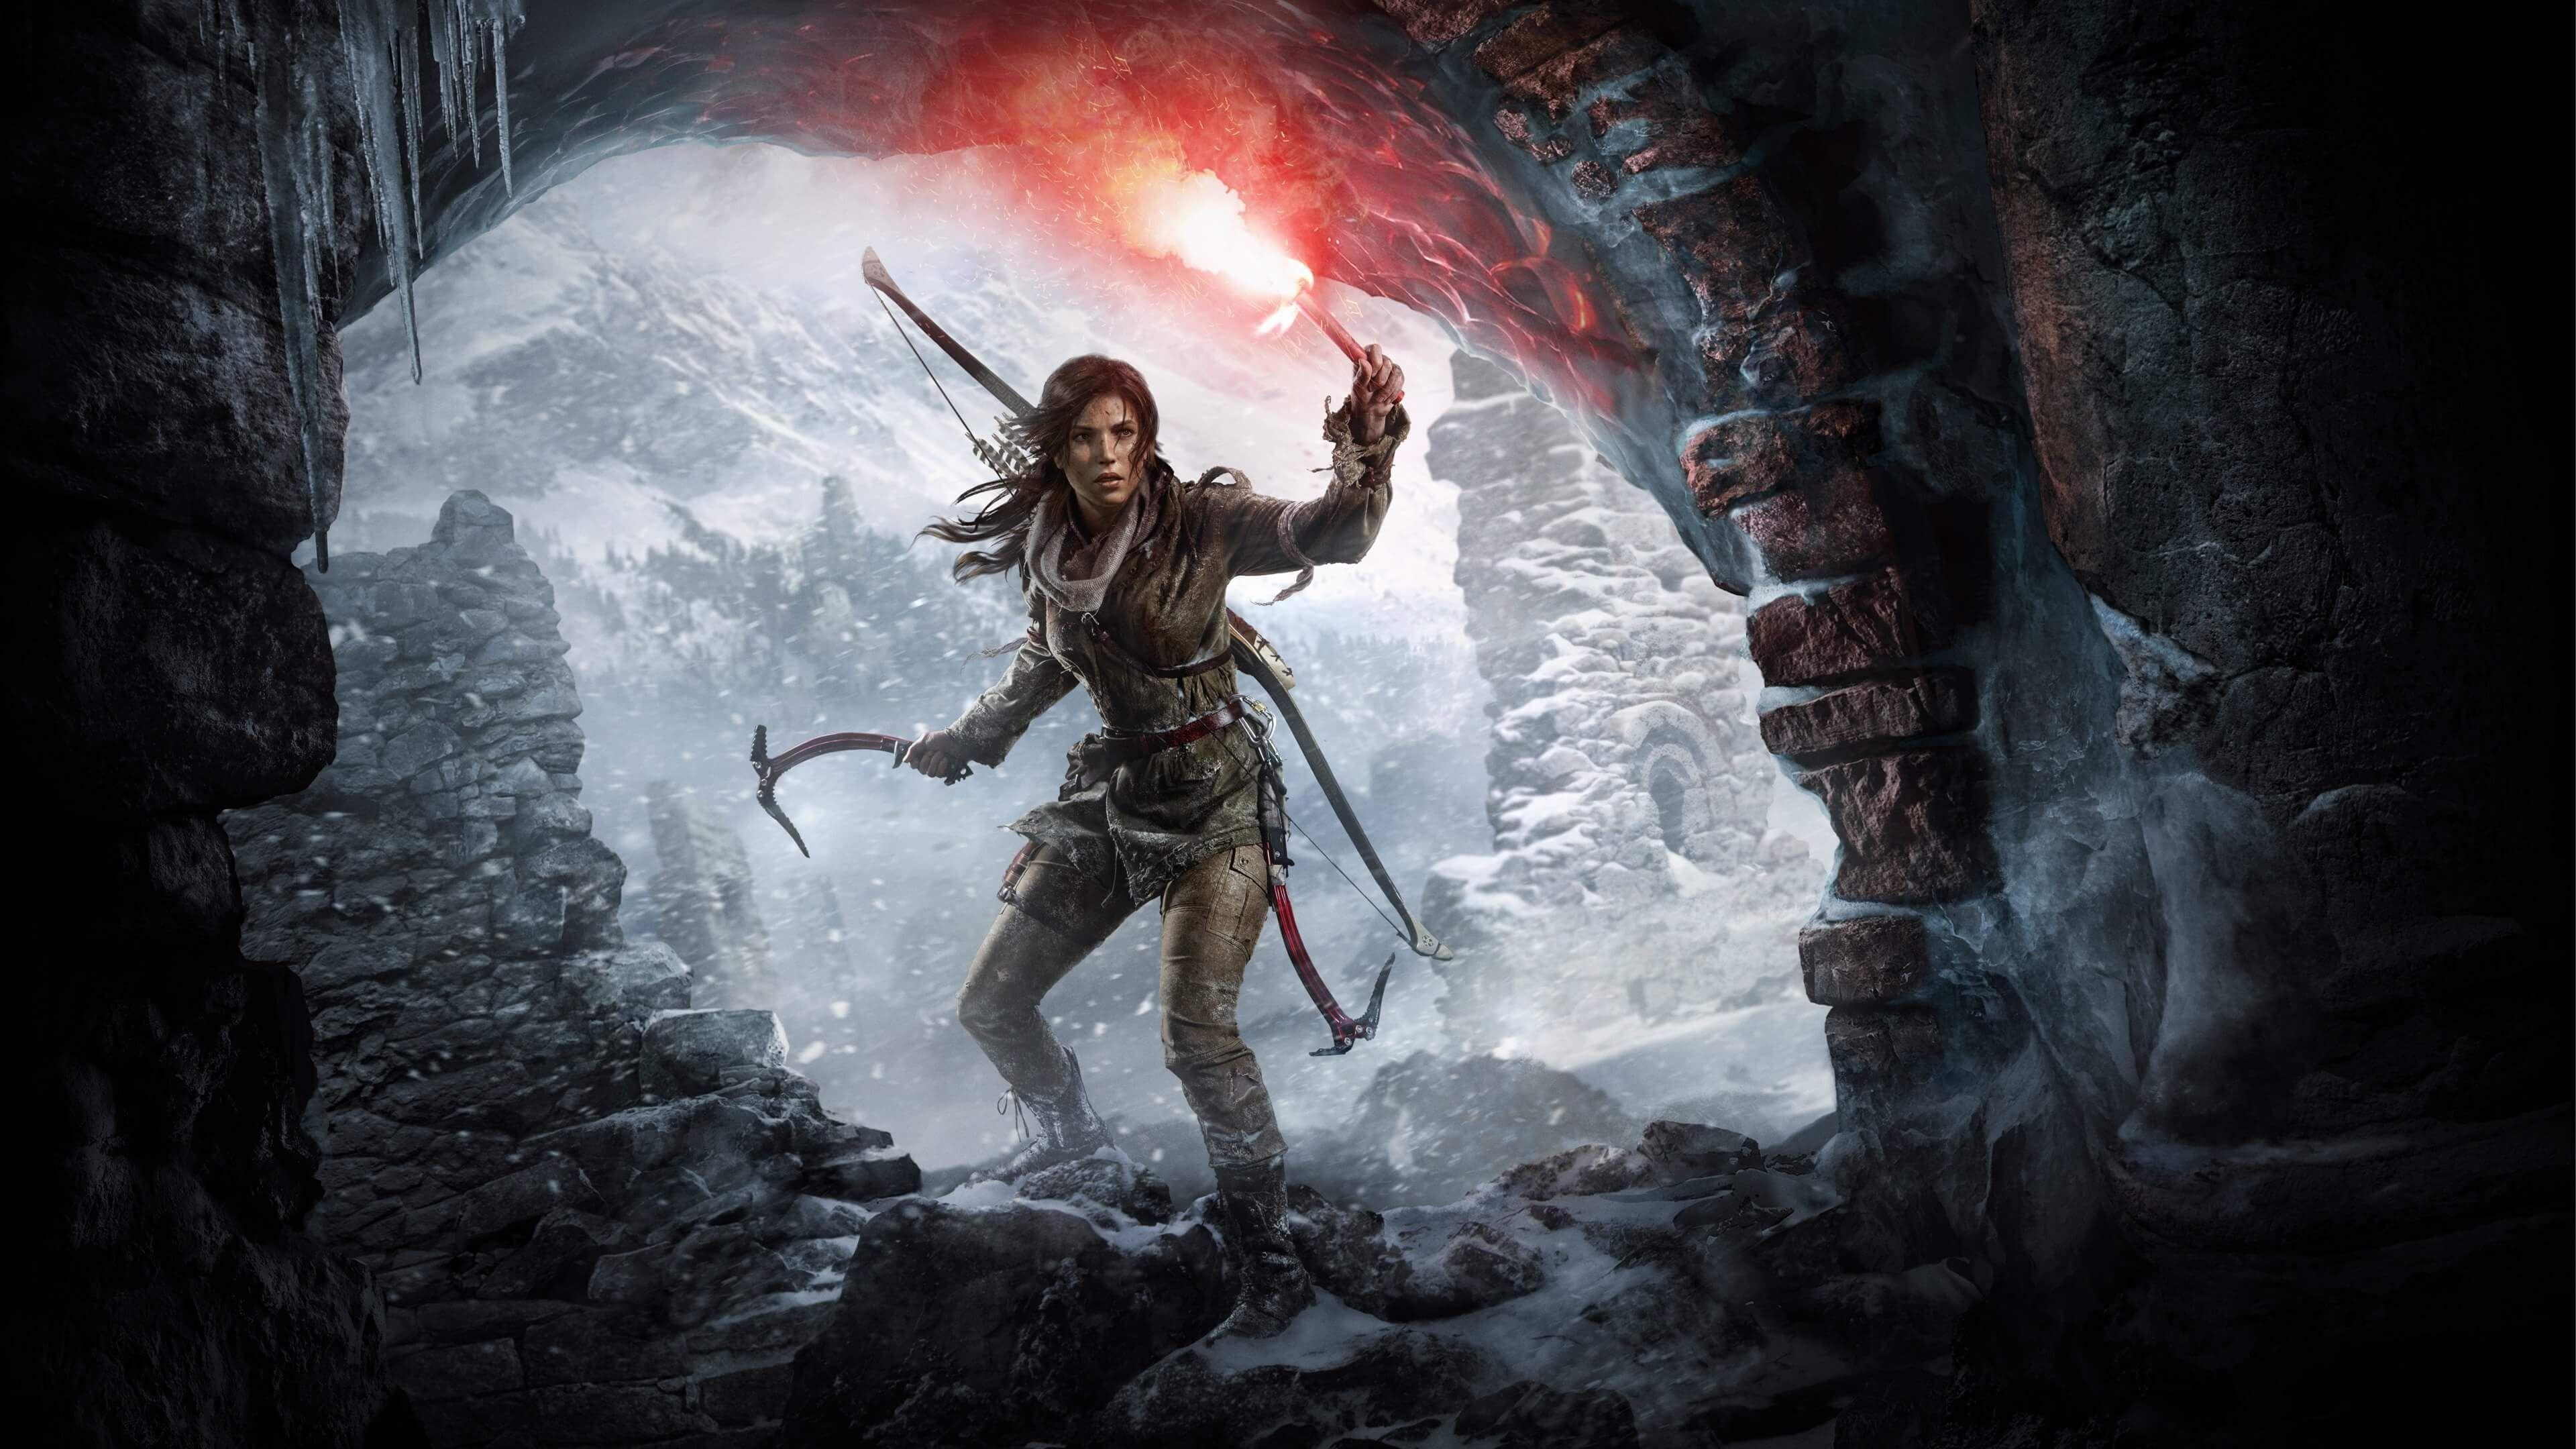 Rise Of Tomb Raider 1 3840x2160 Tomb Raider Wallpaper Tomb Raider Tomb Raider Art